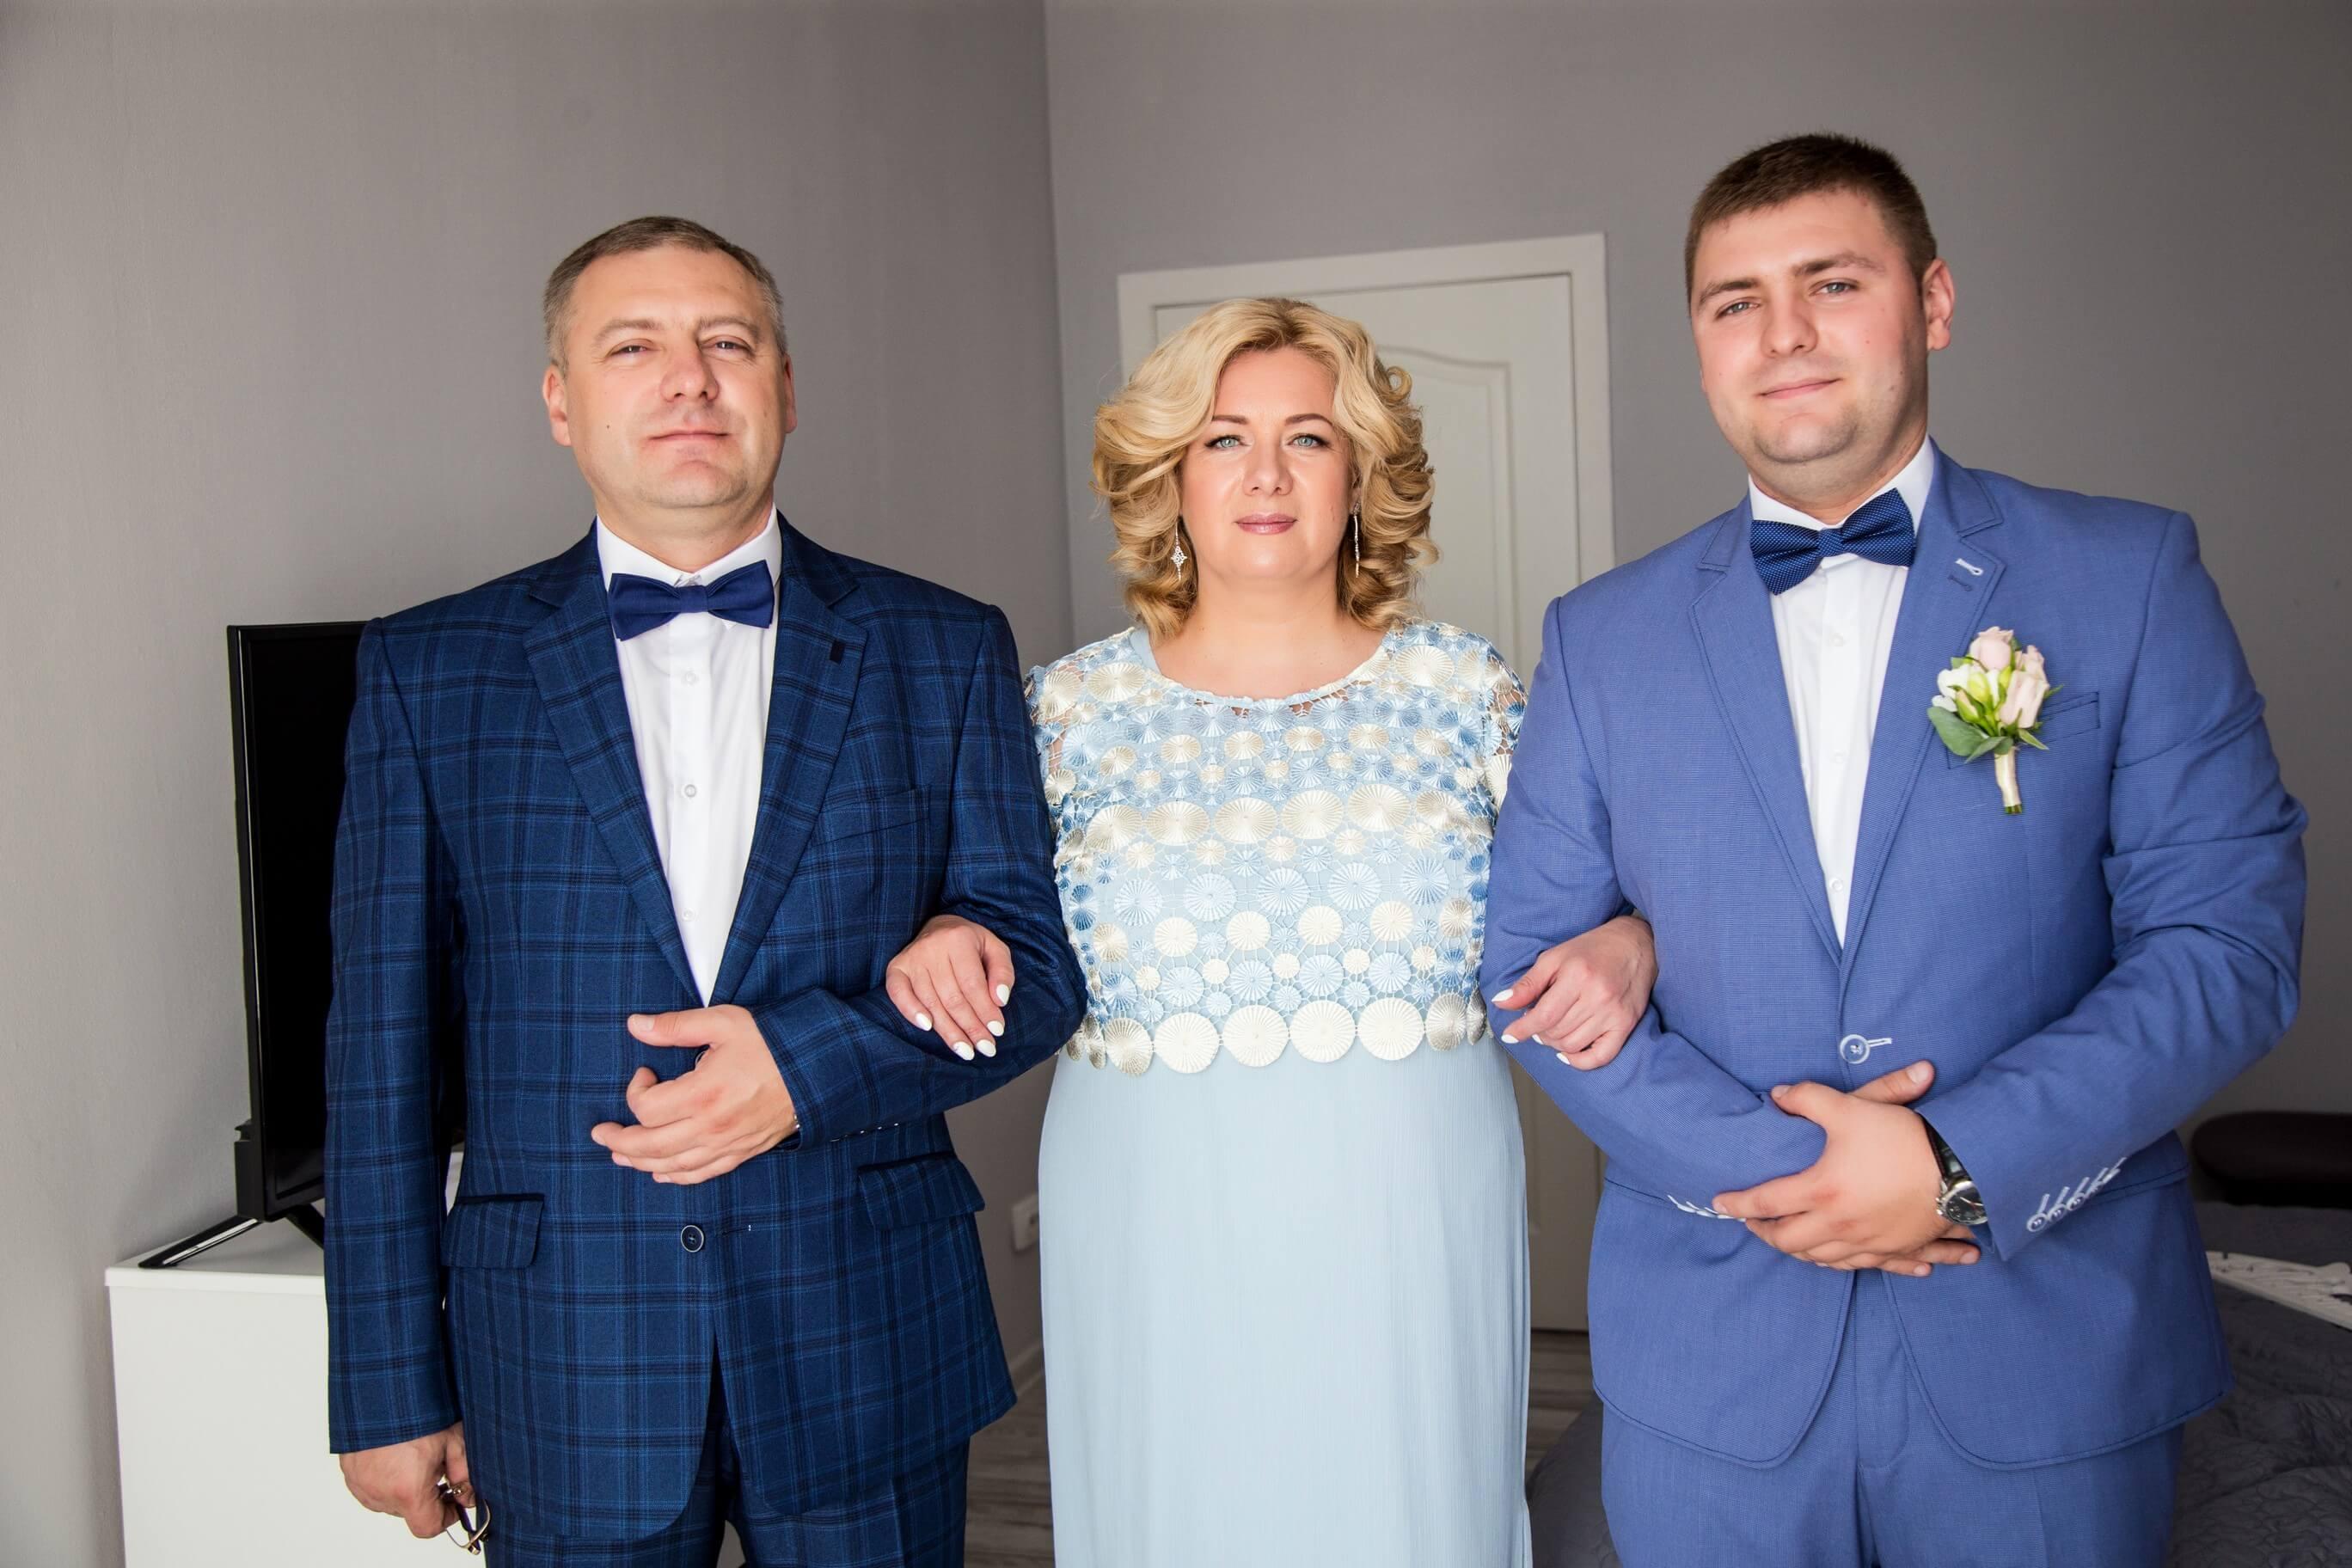 utro zheniha idei svadebnyj fotograf kiev foto zheniha s roditeljami mamoj fotograf kiev (1)